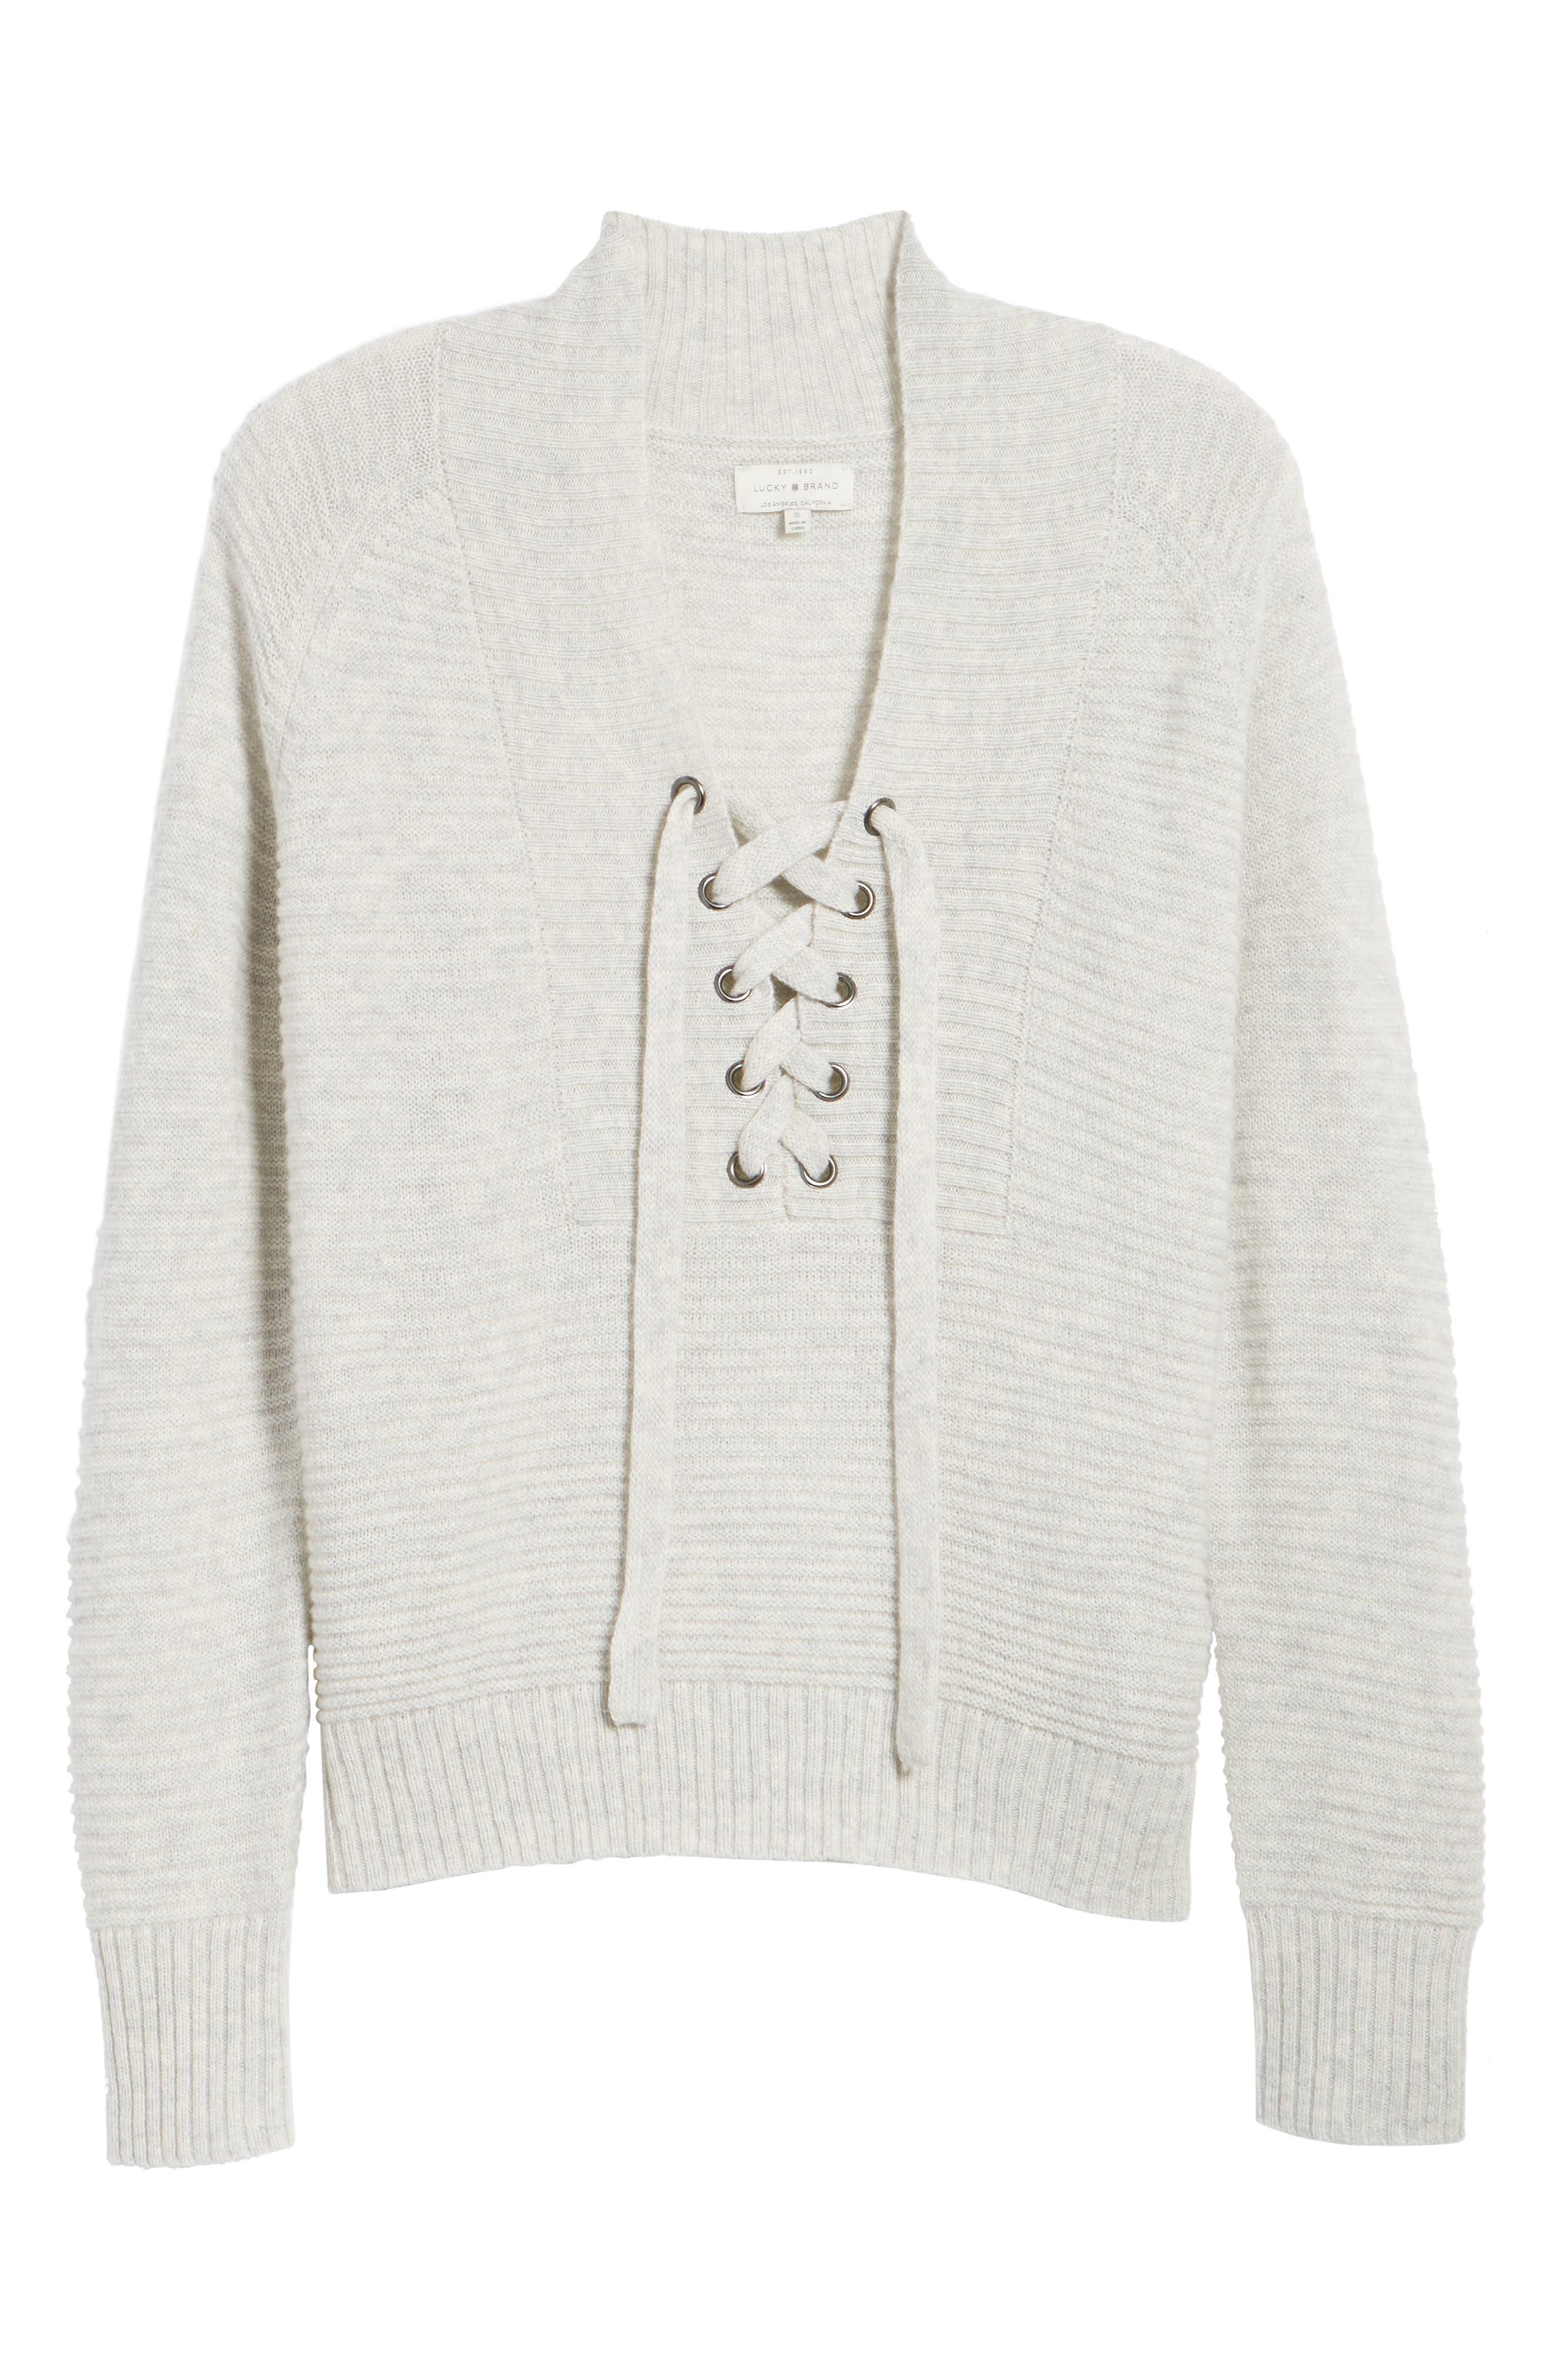 Lace-Up Sweater,                             Main thumbnail 1, color,                             Mercury